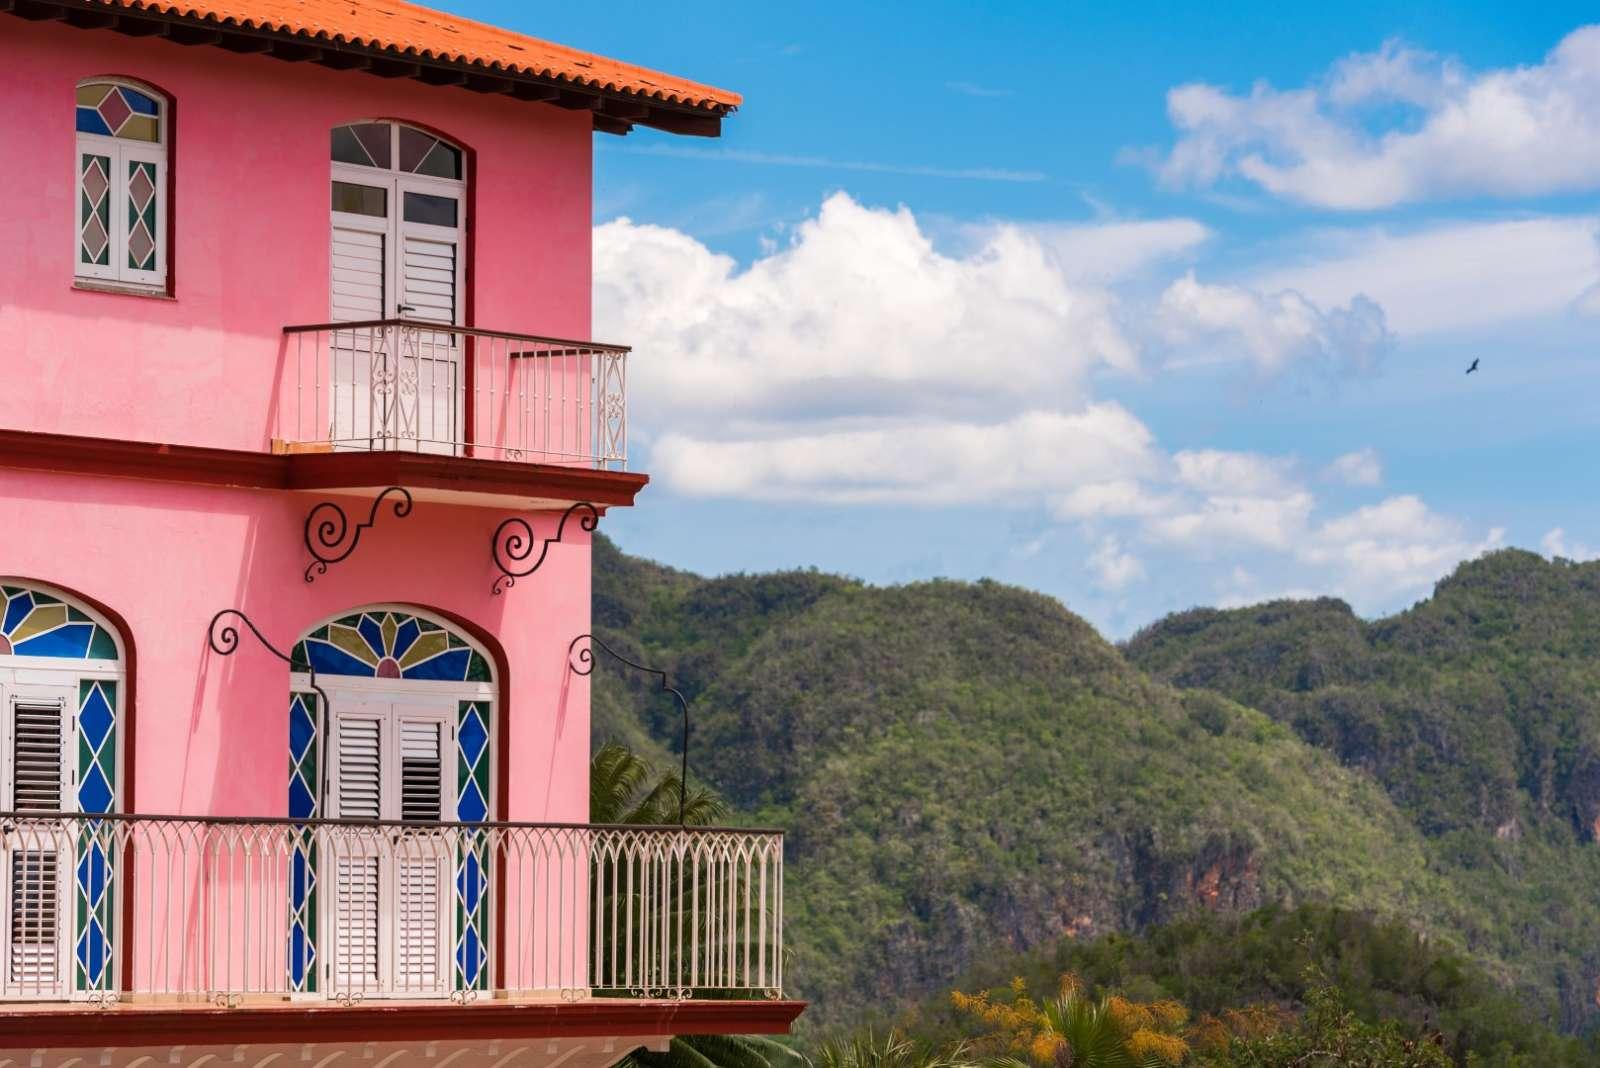 Corner of Hotel Los Jazmines in Vinales, Cuba